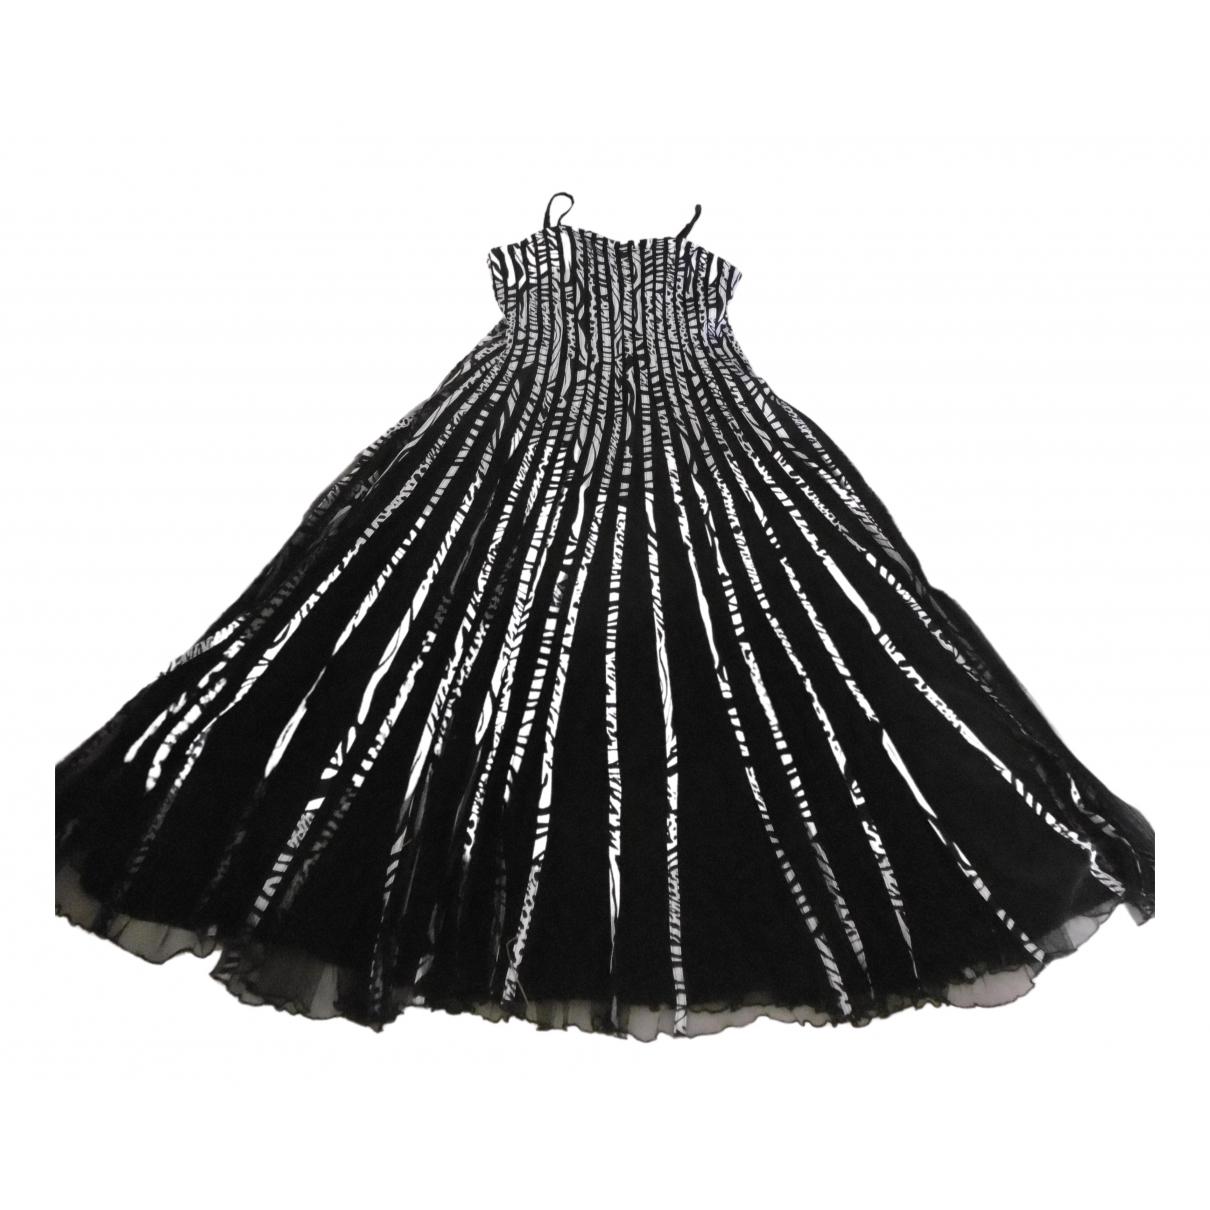 Chantal Thomass N Black dress for Women 40 FR